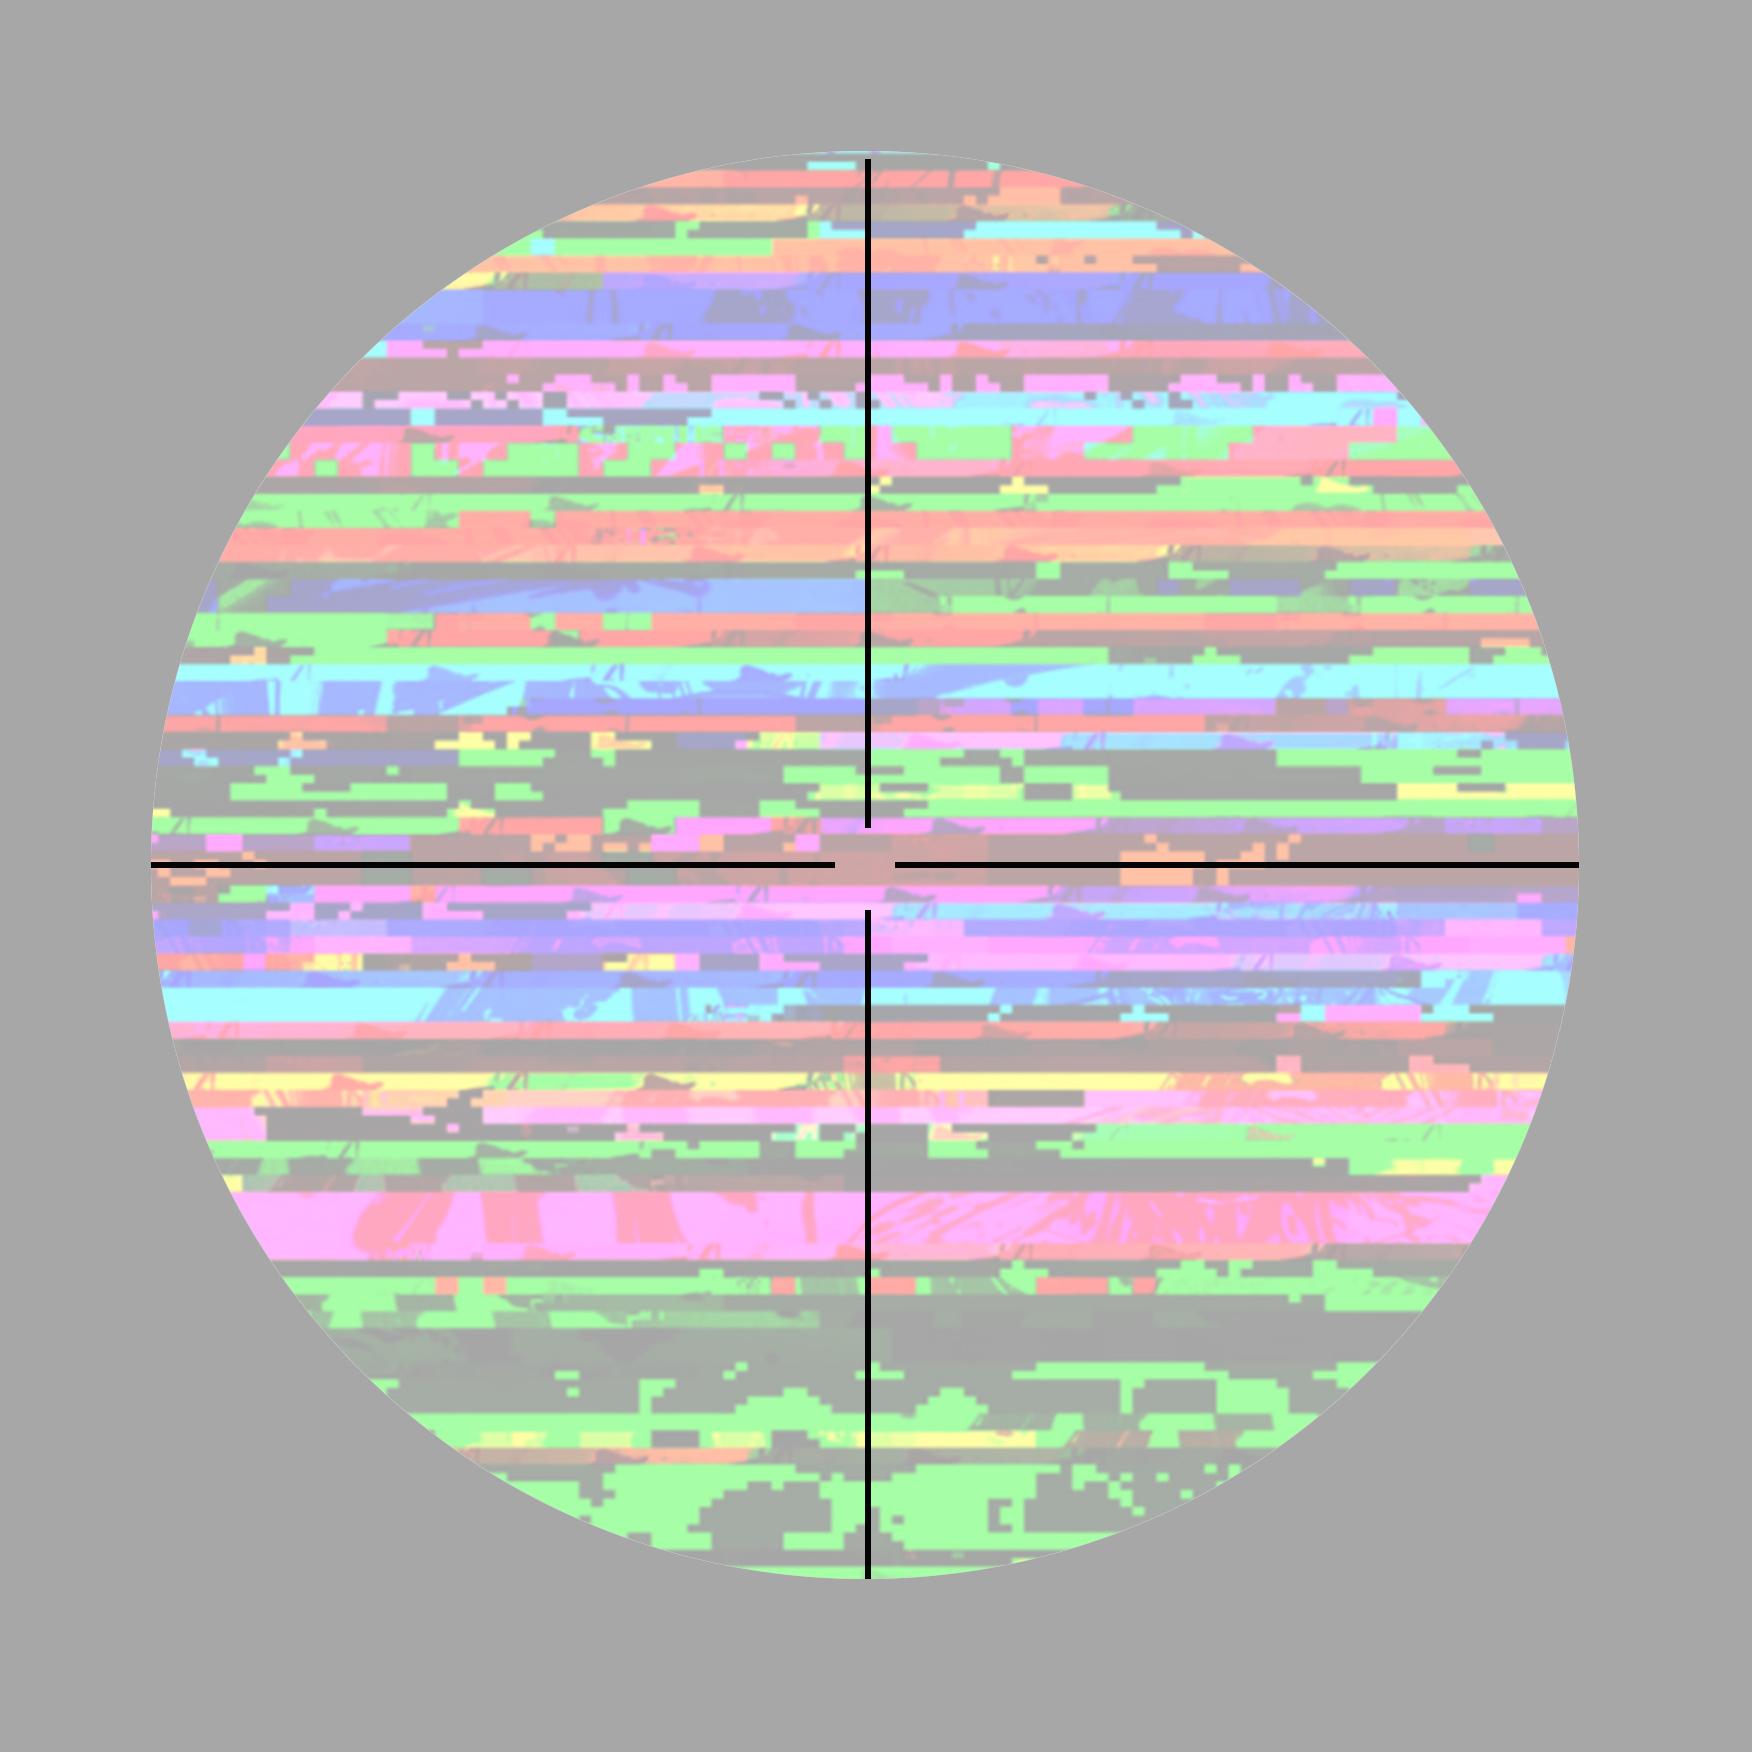 Ling-lin Ku, Vanishing Point, 2021. Folded Pixelated/glitched Digital Prints. Courtesy Of The Artist.